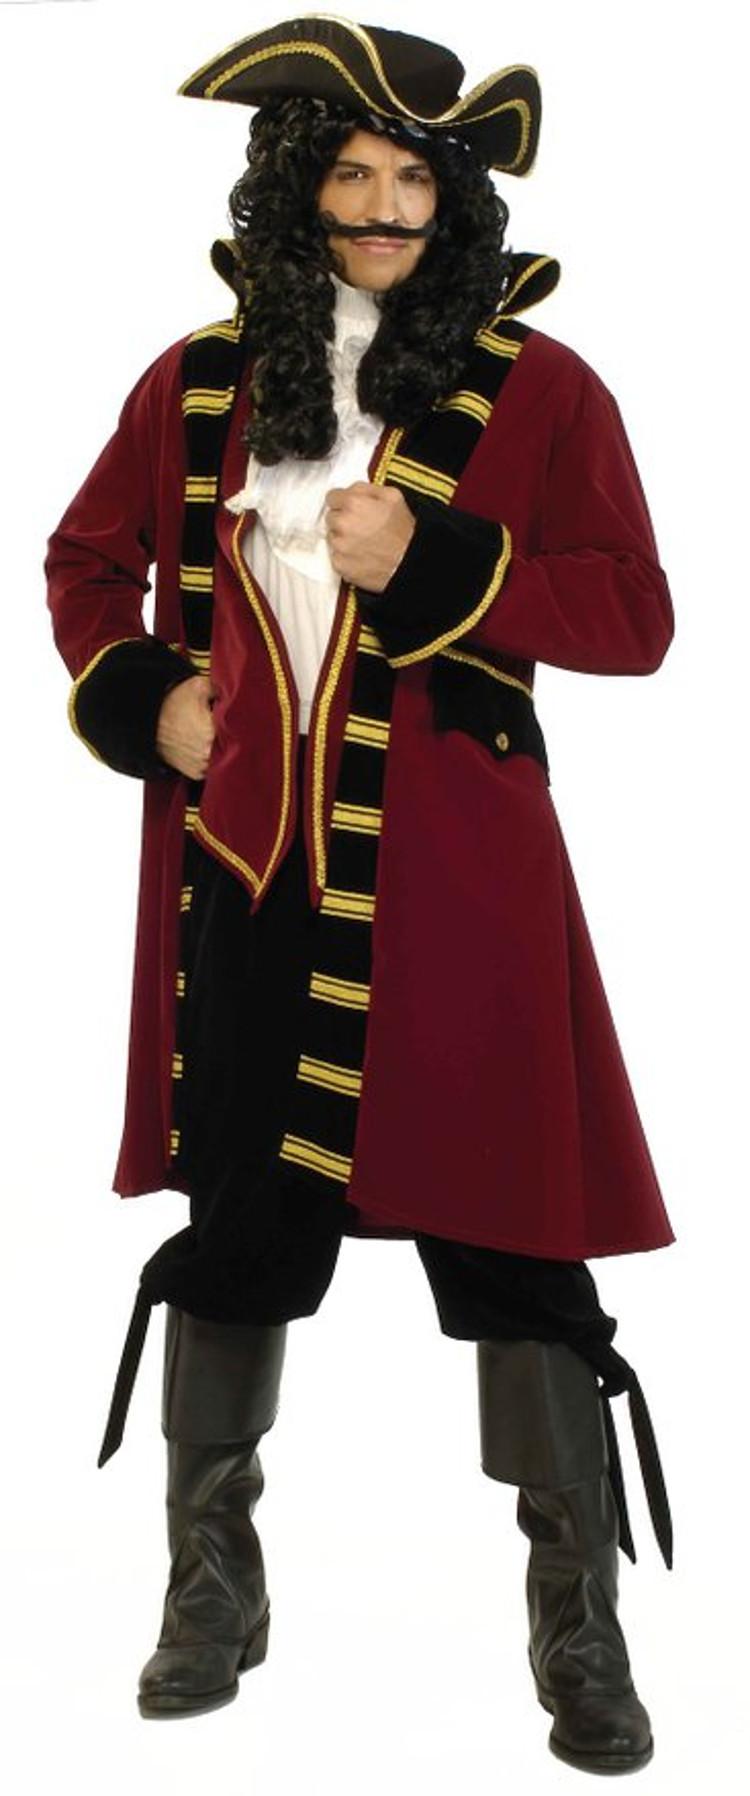 designer deluxe pirate captain halloween costume